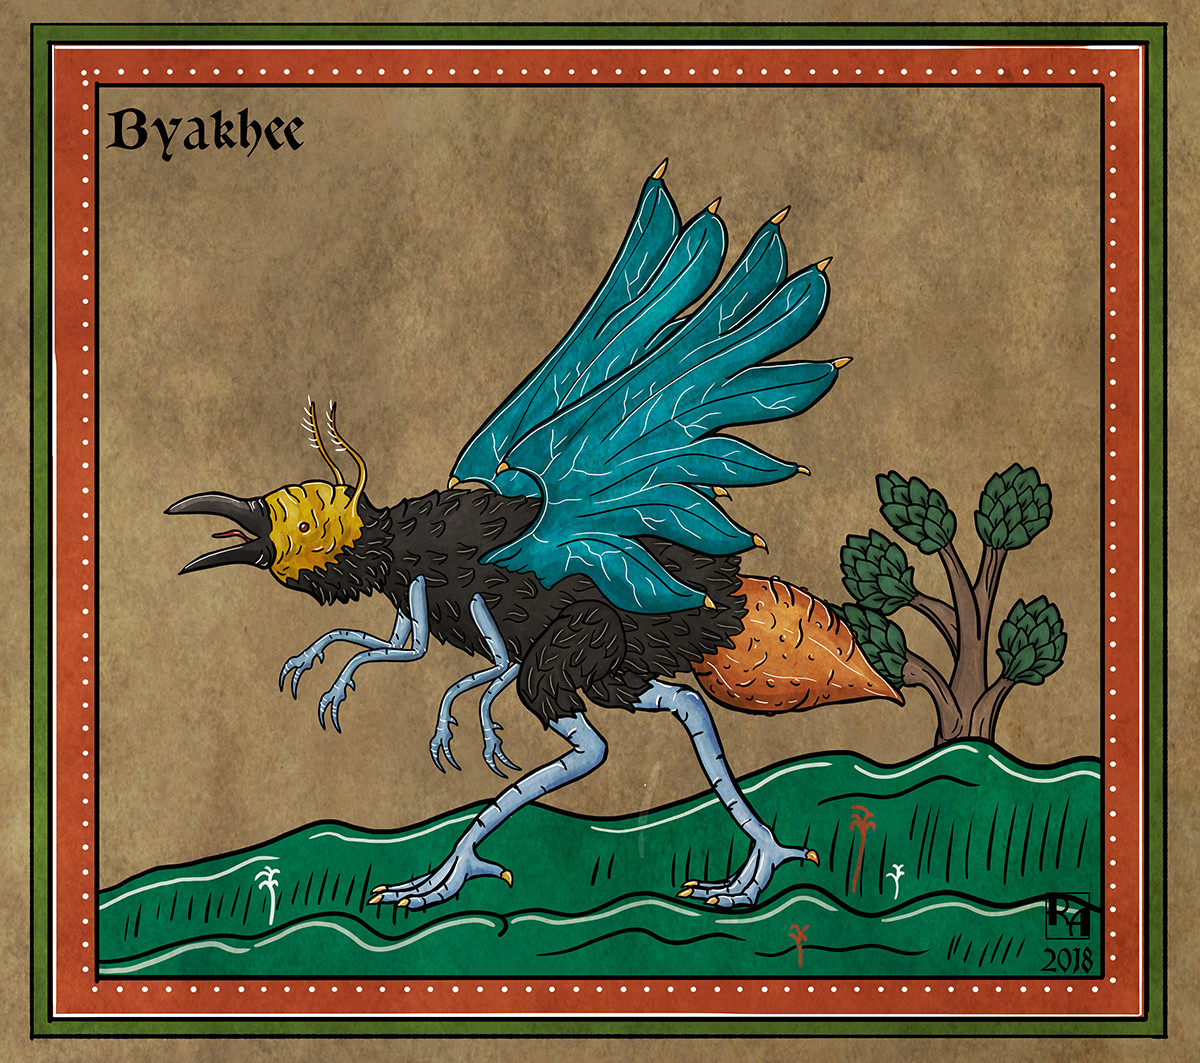 Byakhee